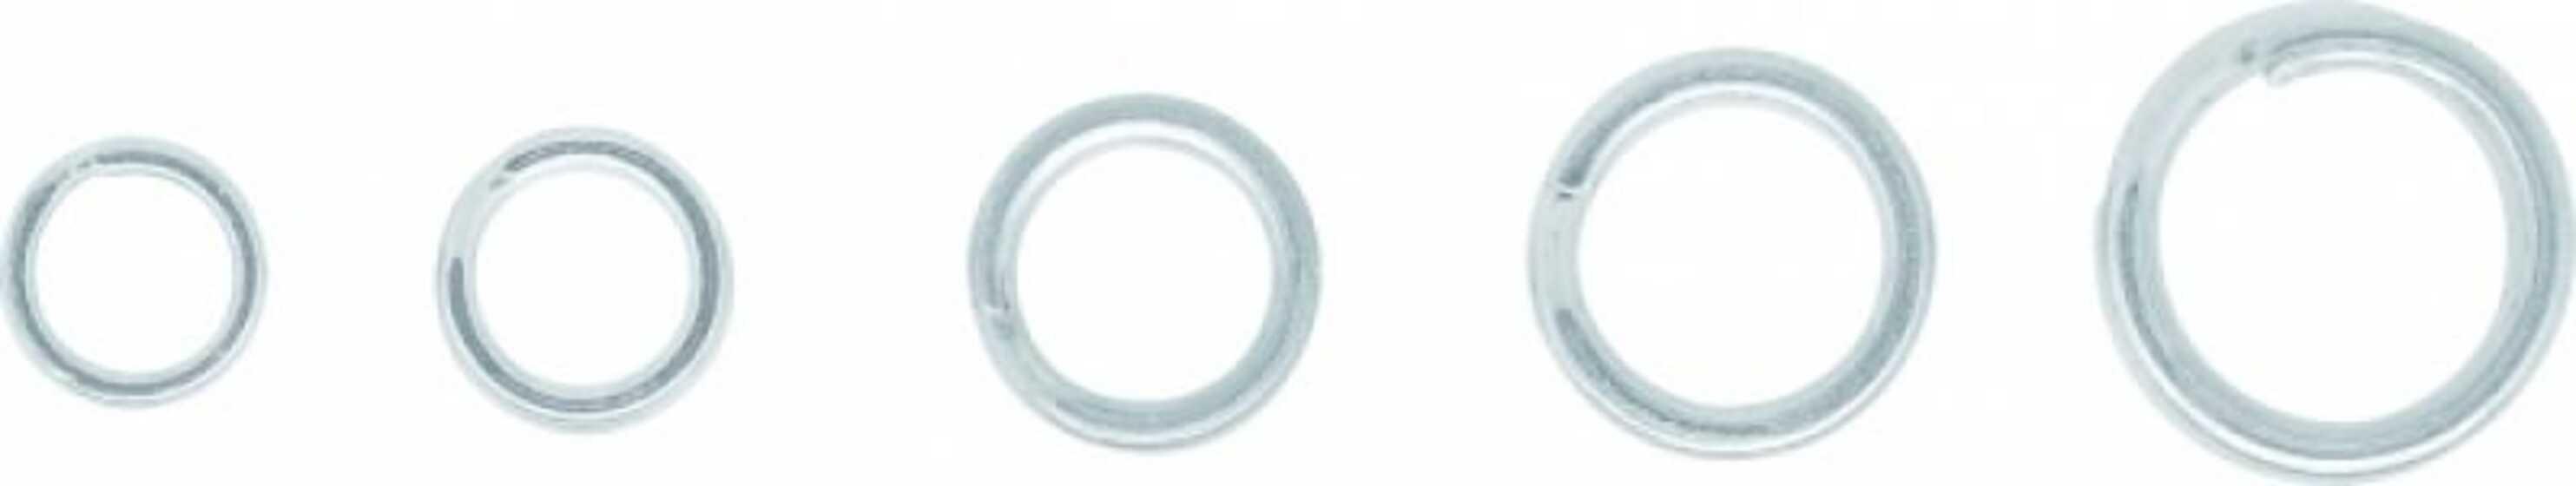 Pezon - Michel Split Ring